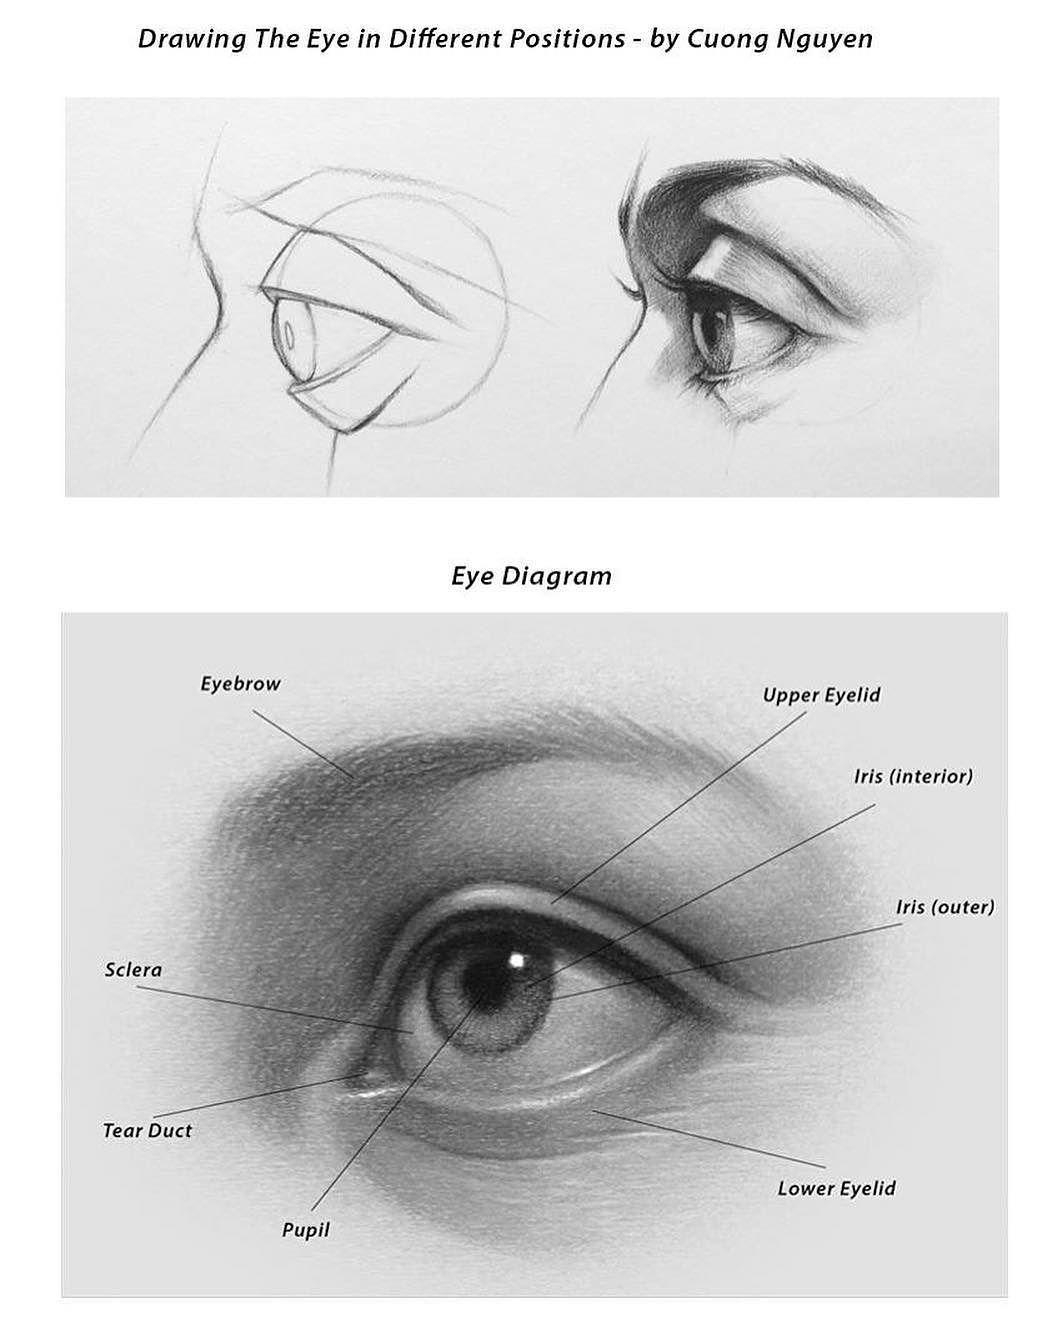 Pin by Fouli on Ευκολη Ζωγραφική   Pinterest   Drawings